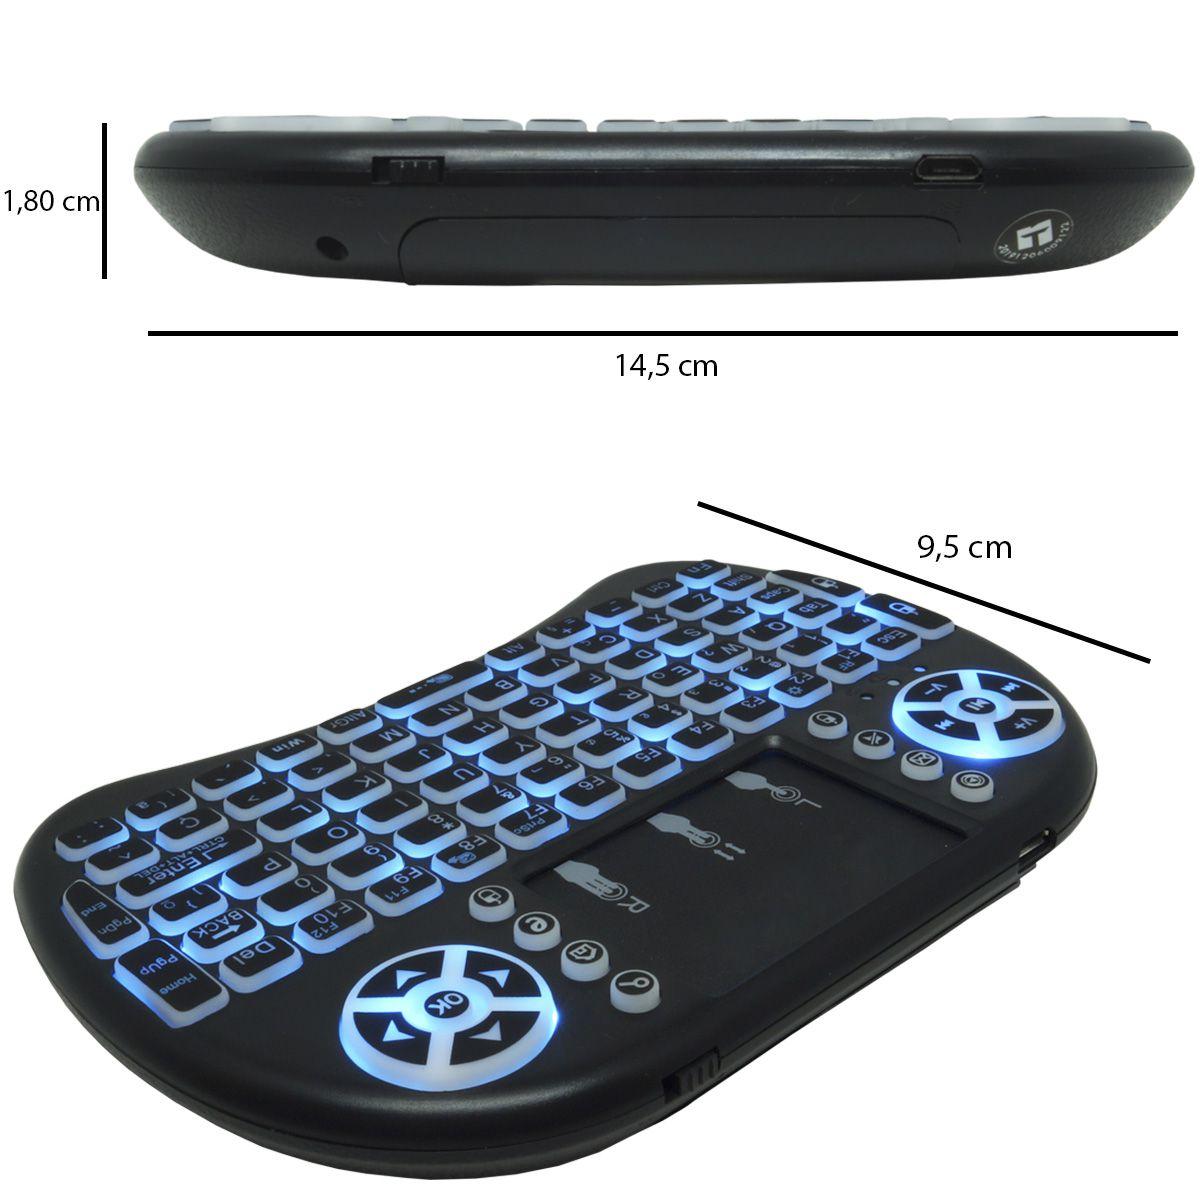 Mini Teclado Mouse Iluminado Led Touchpad Wireless Bluetooth Wifi Sem Fio Tv Smart Usb I8 Preto